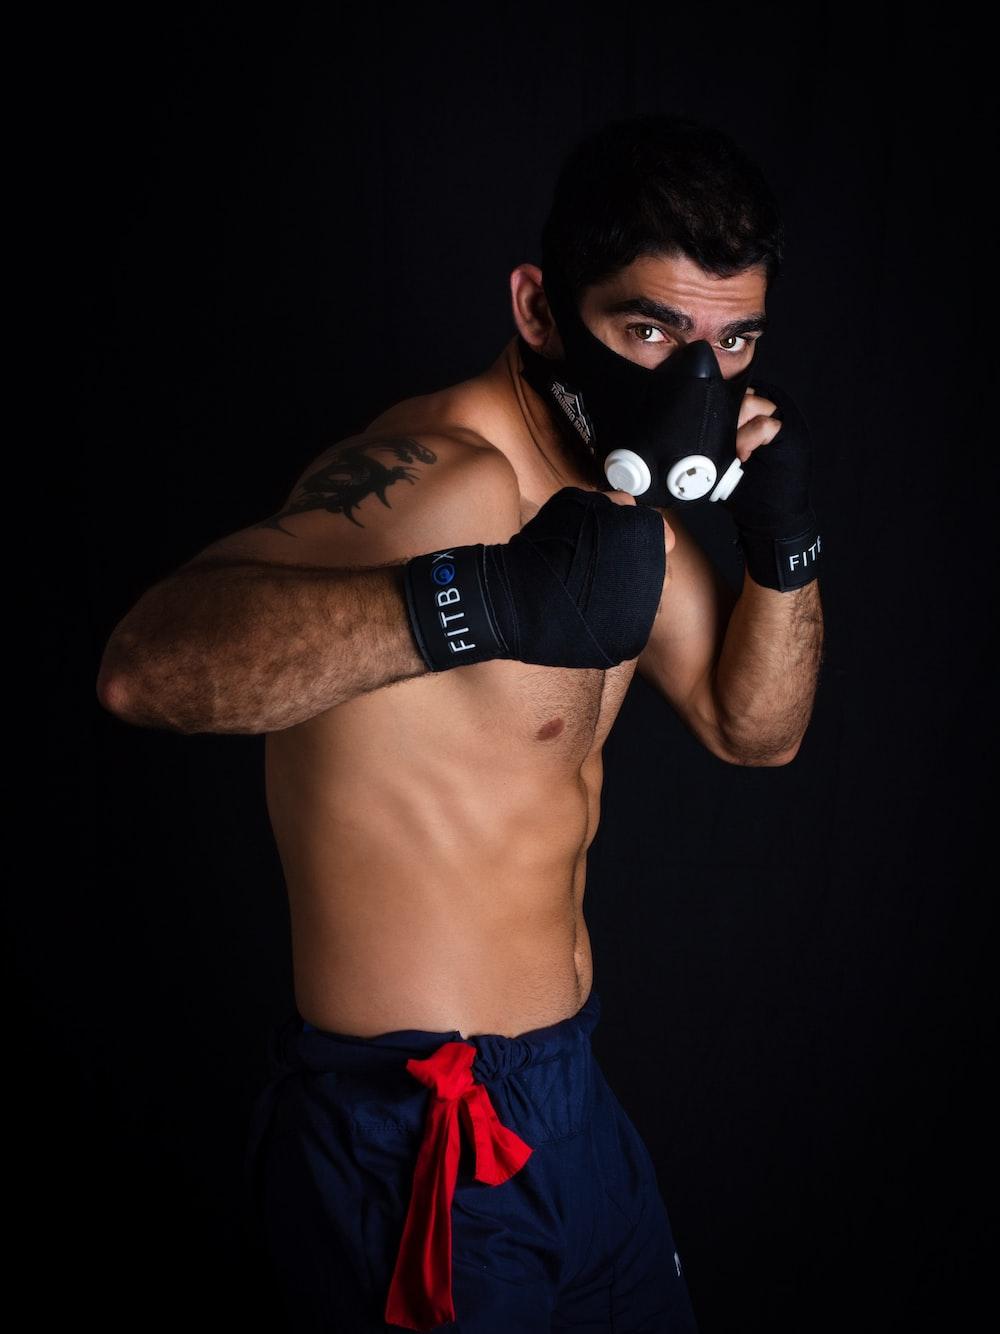 topless man wearing black boxing gloves